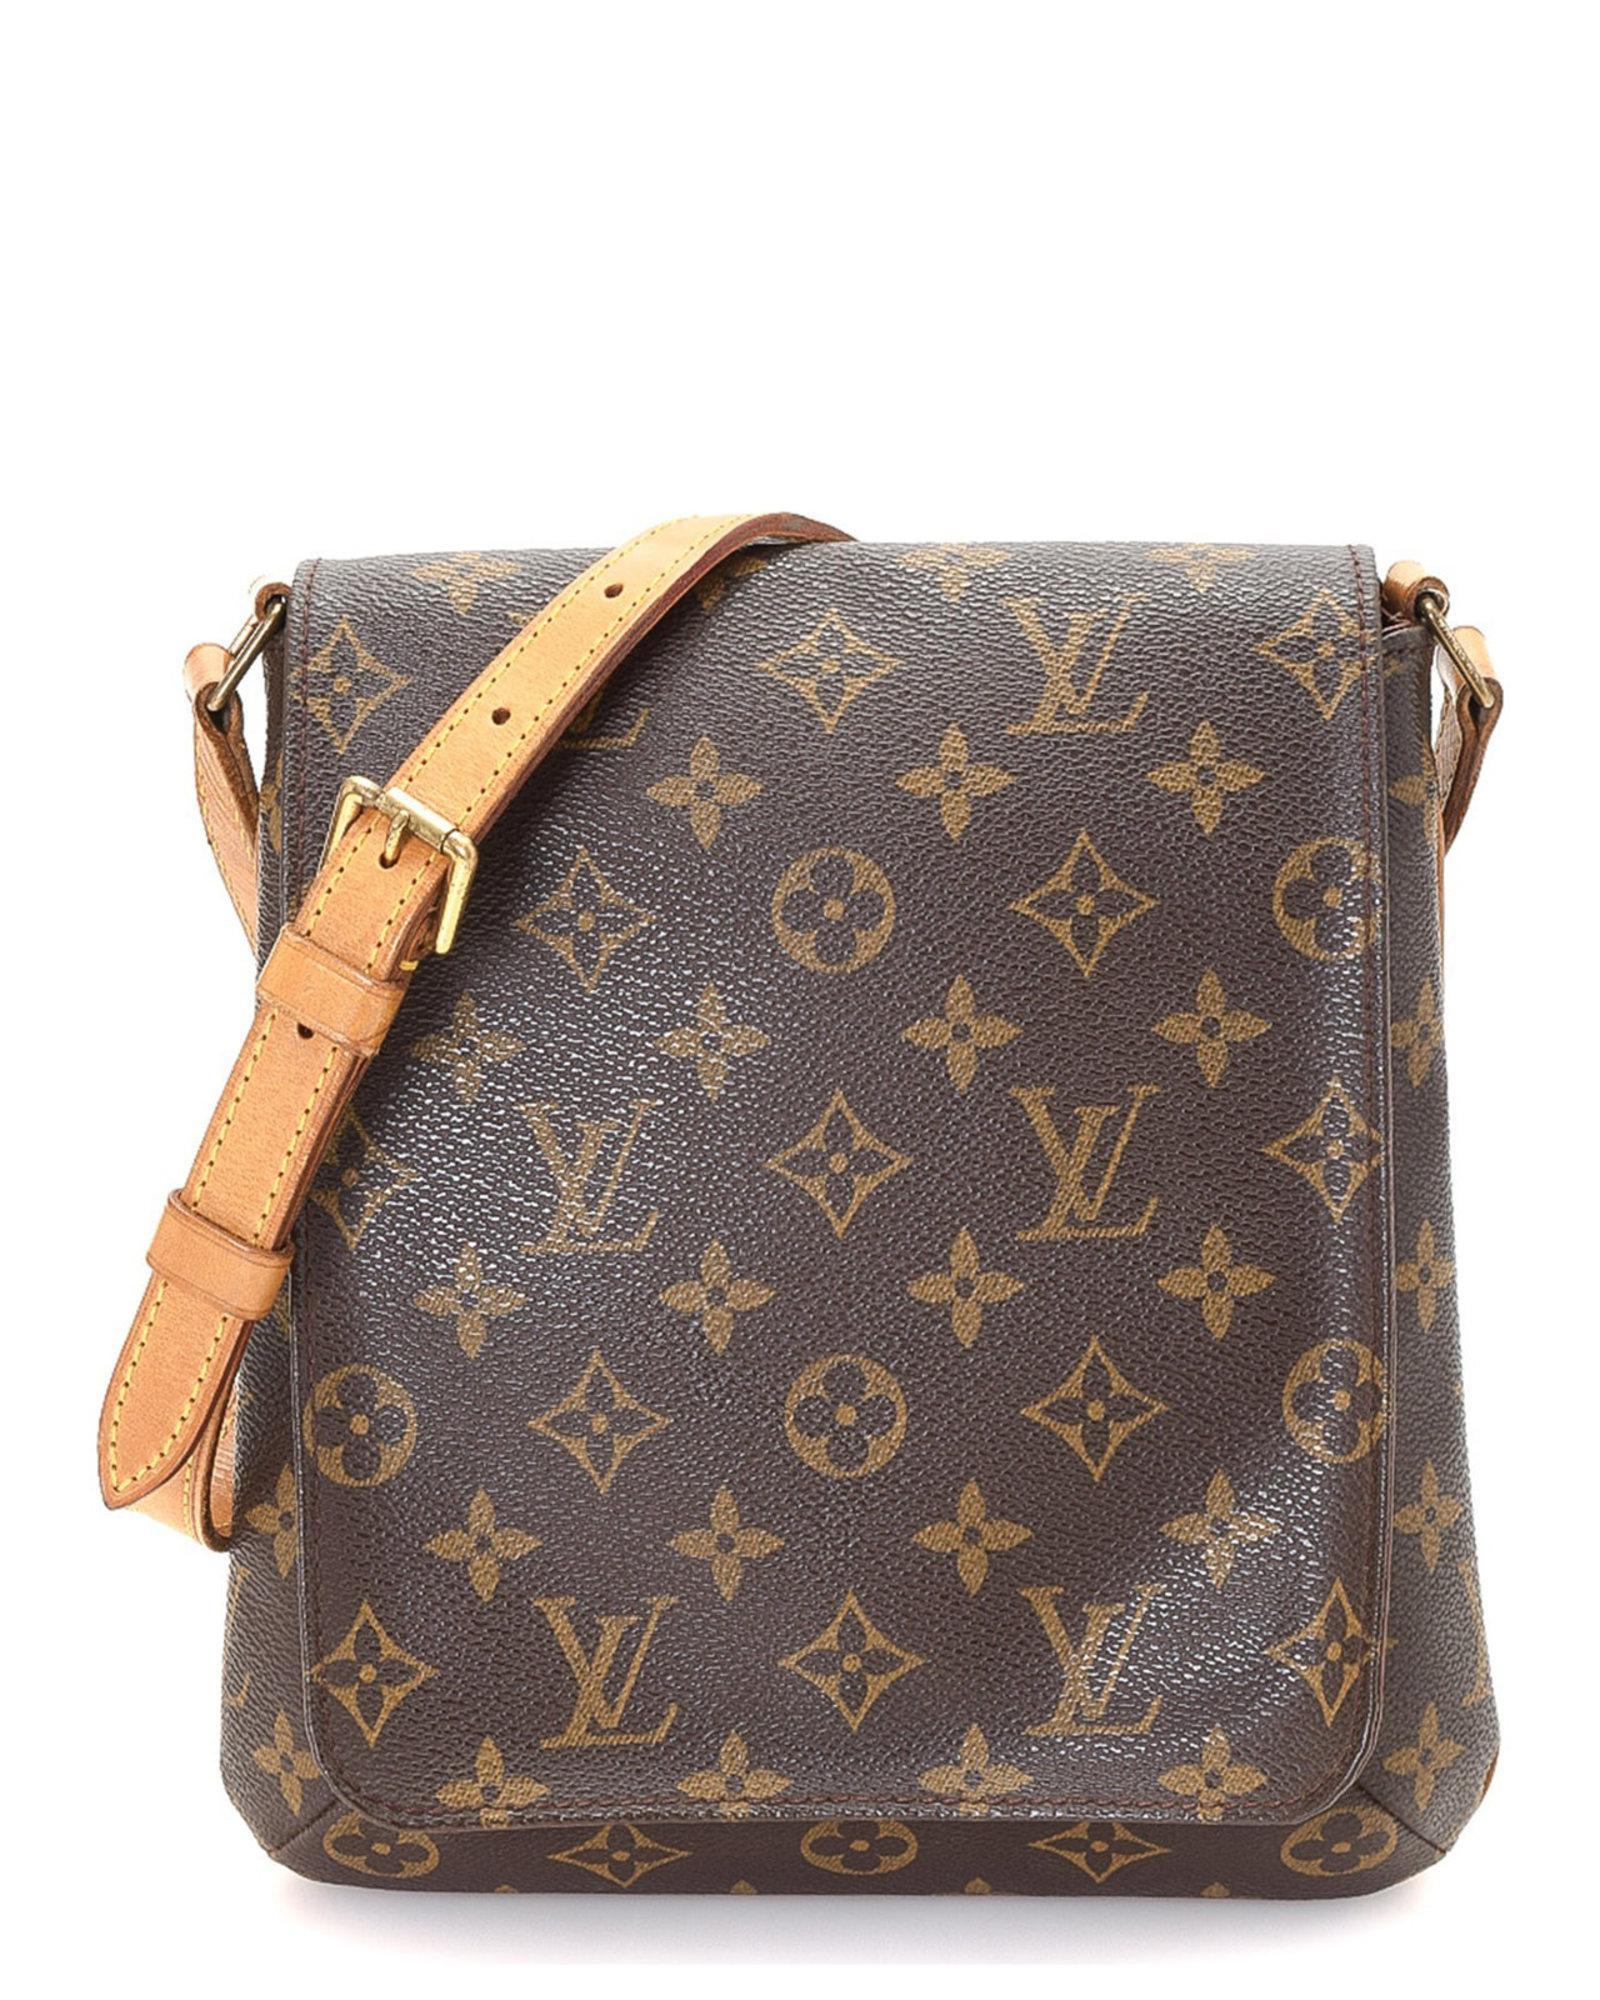 1cede83c41d11 Louis Vuitton Musette Salsa Long Strap Crossbody - Vintage in Brown ...